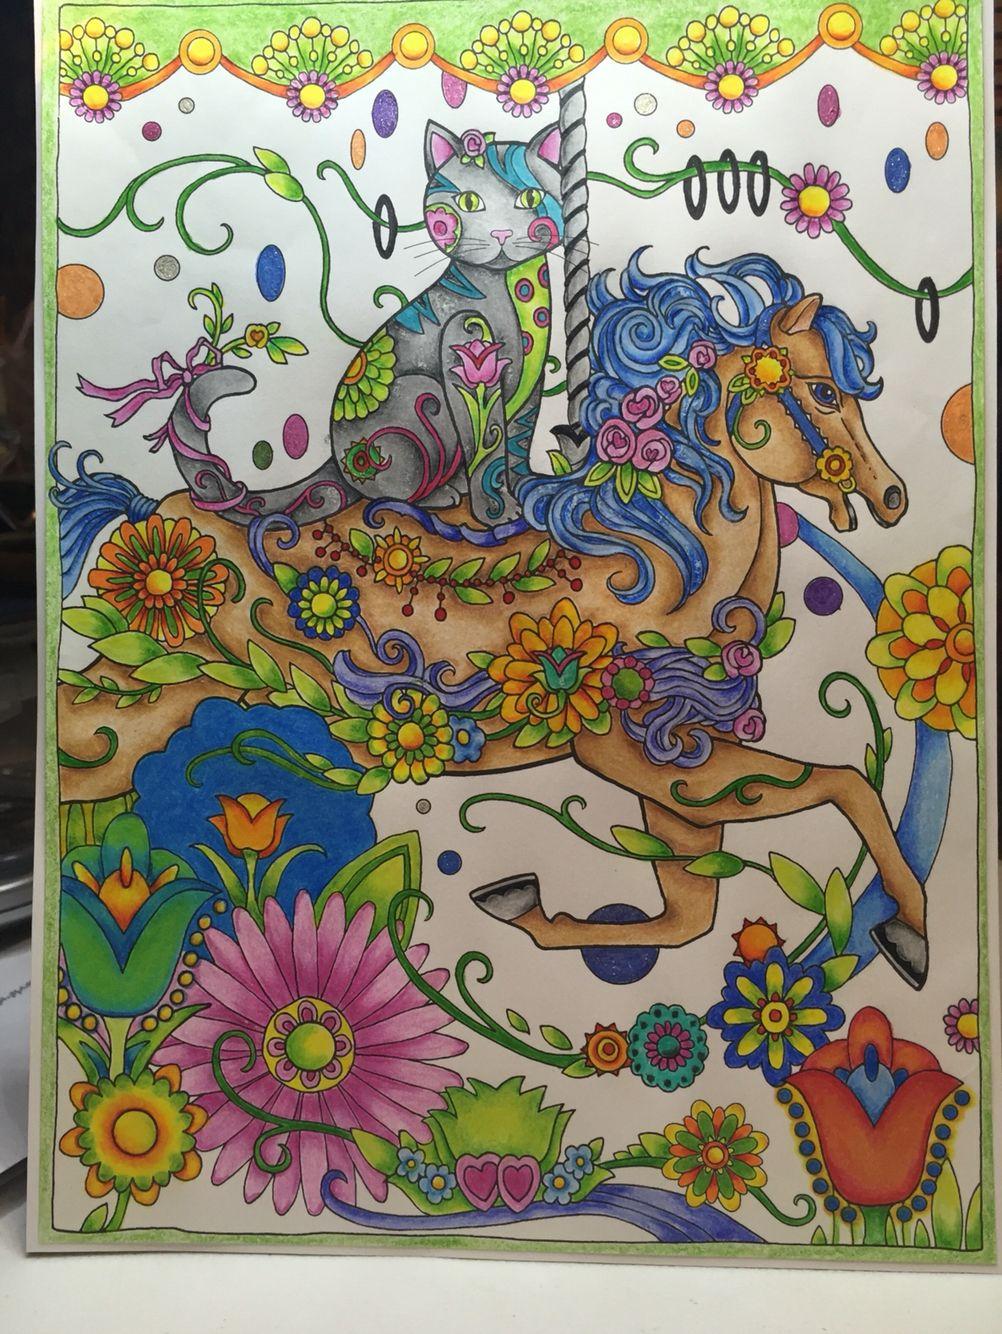 HORSING AROUND | Laminas | Pinterest | Gato, Laminas y Porcelana